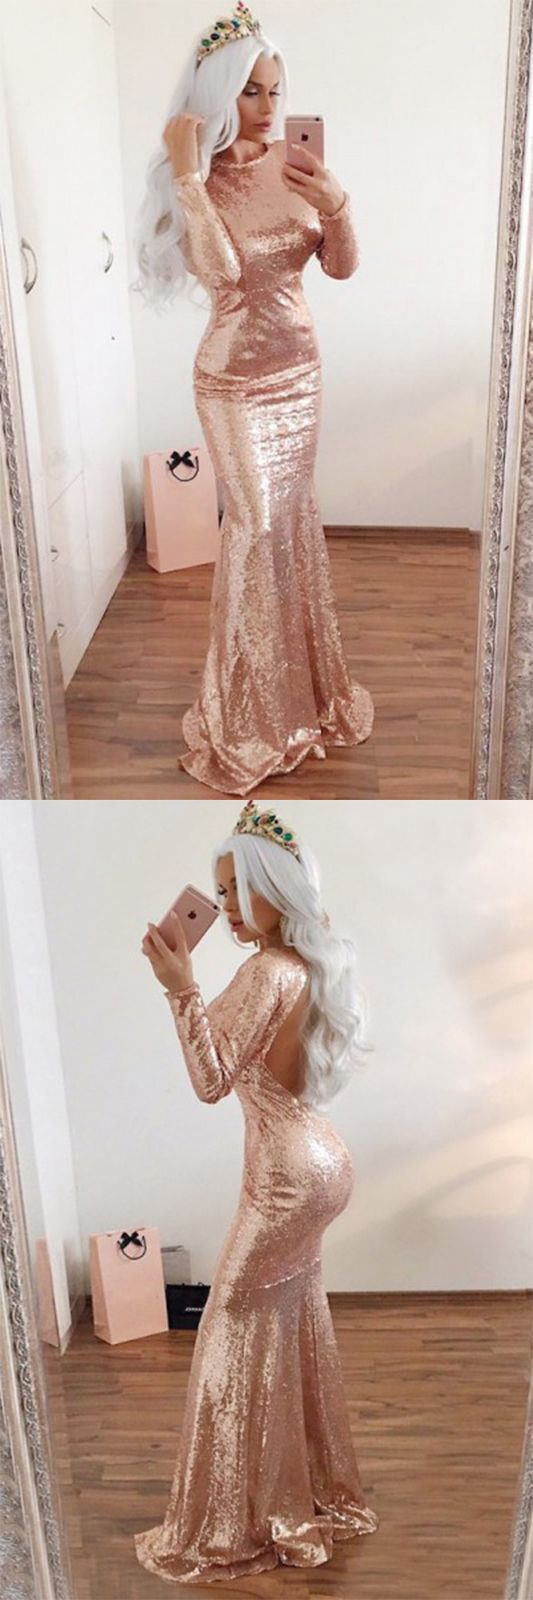 Mermaid prom dresseslong sleeve prom dressrose gold prom dresses